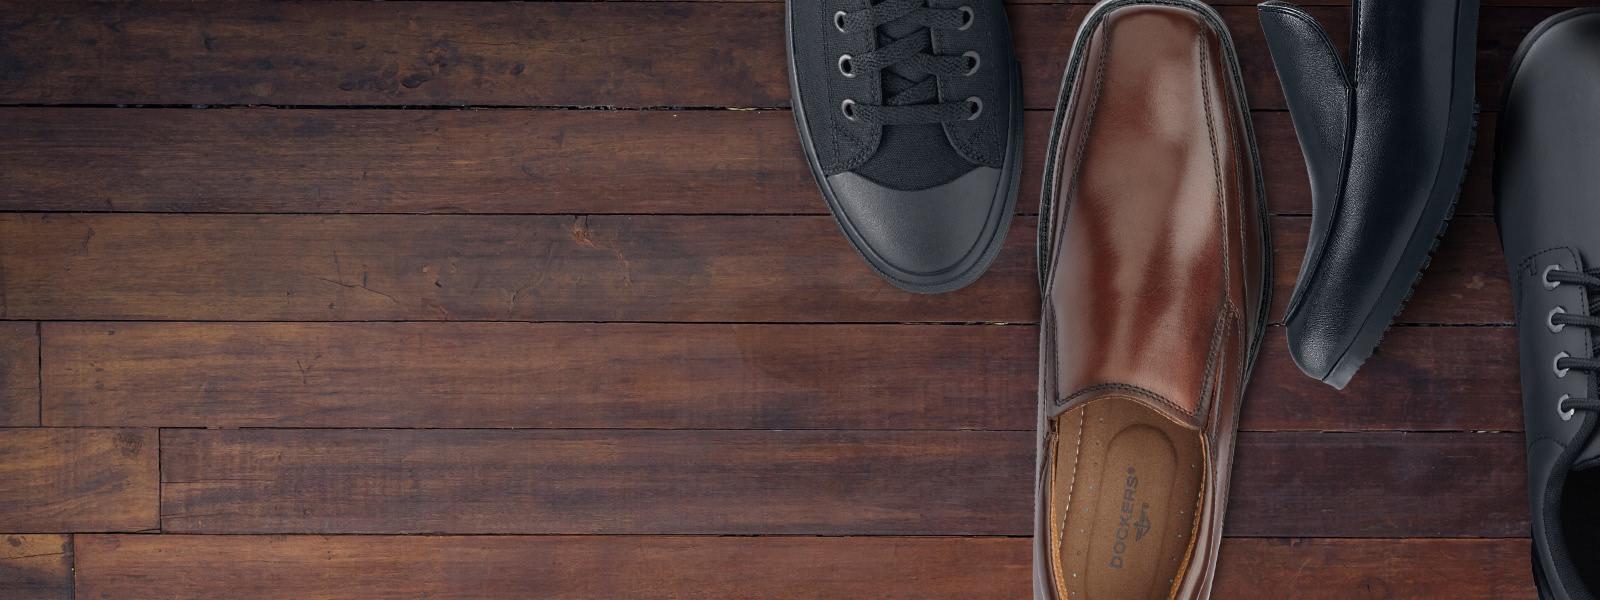 Restaurant Shoes: Non-Slip Shoes for Chefs & Servers